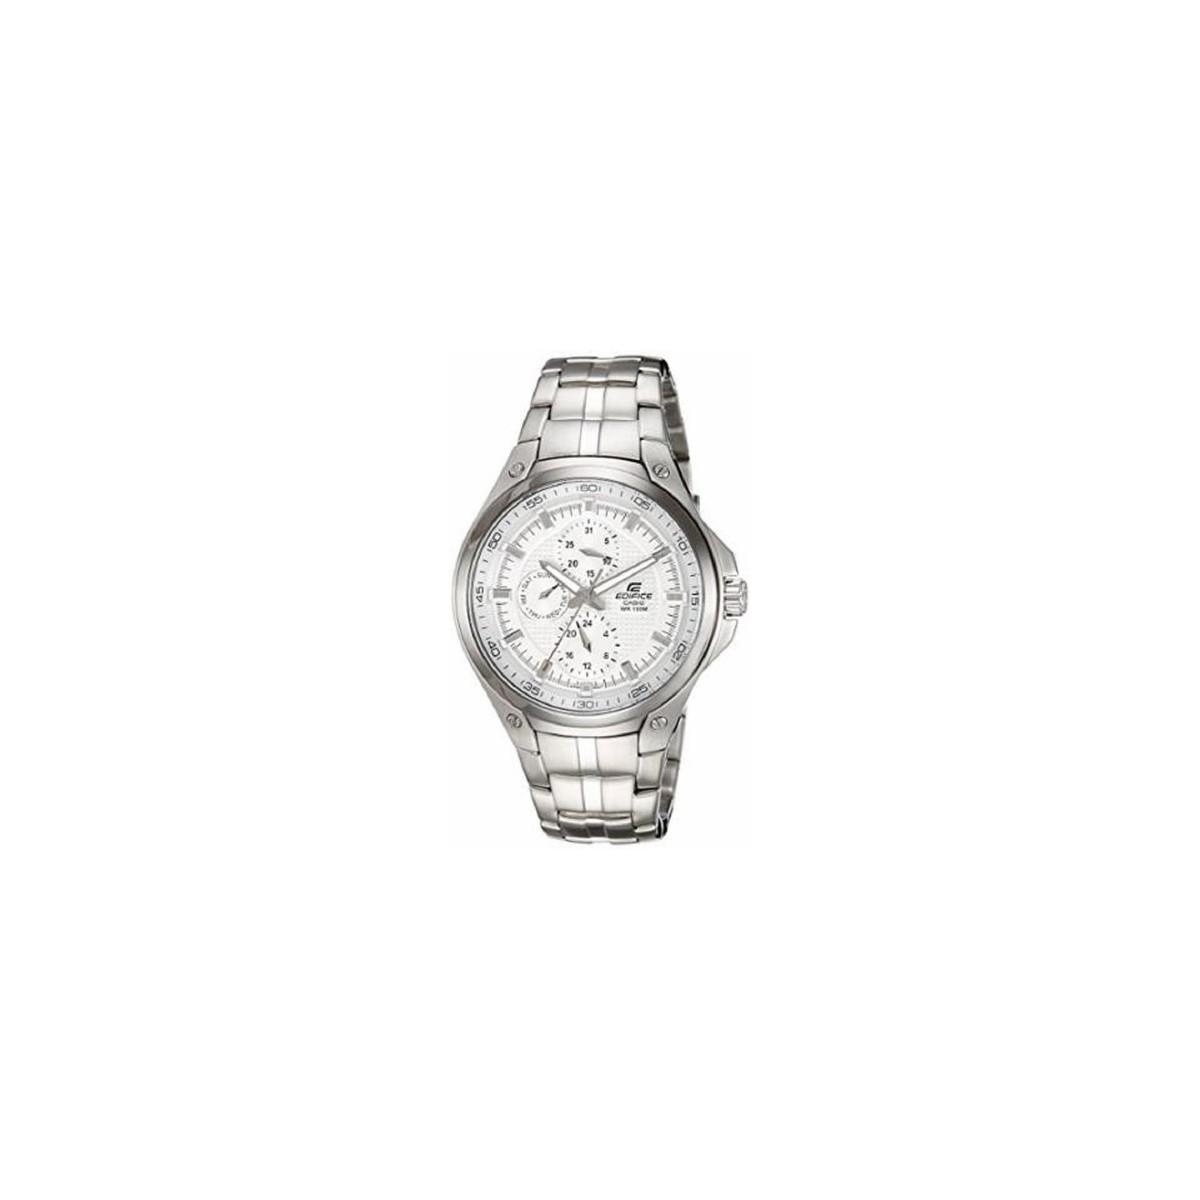 https://www.gaberjoyeria.com/5731-thickbox_default/reloj-casio-edifice.jpg